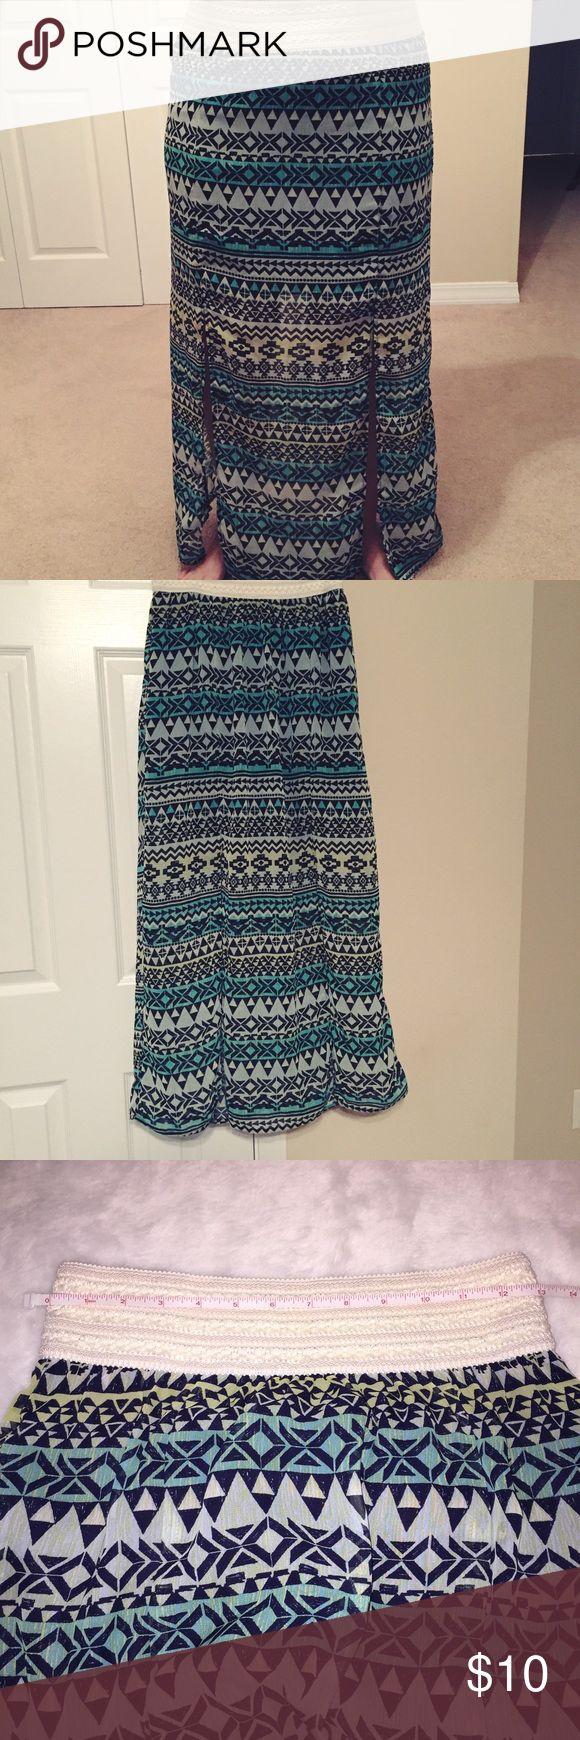 Selling this 🎀 Flowy skirt with slits on the side on Poshmark! My username is: posh_vintage13. #shopmycloset #poshmark #fashion #shopping #style #forsale #No Boundaries #Dresses & Skirts